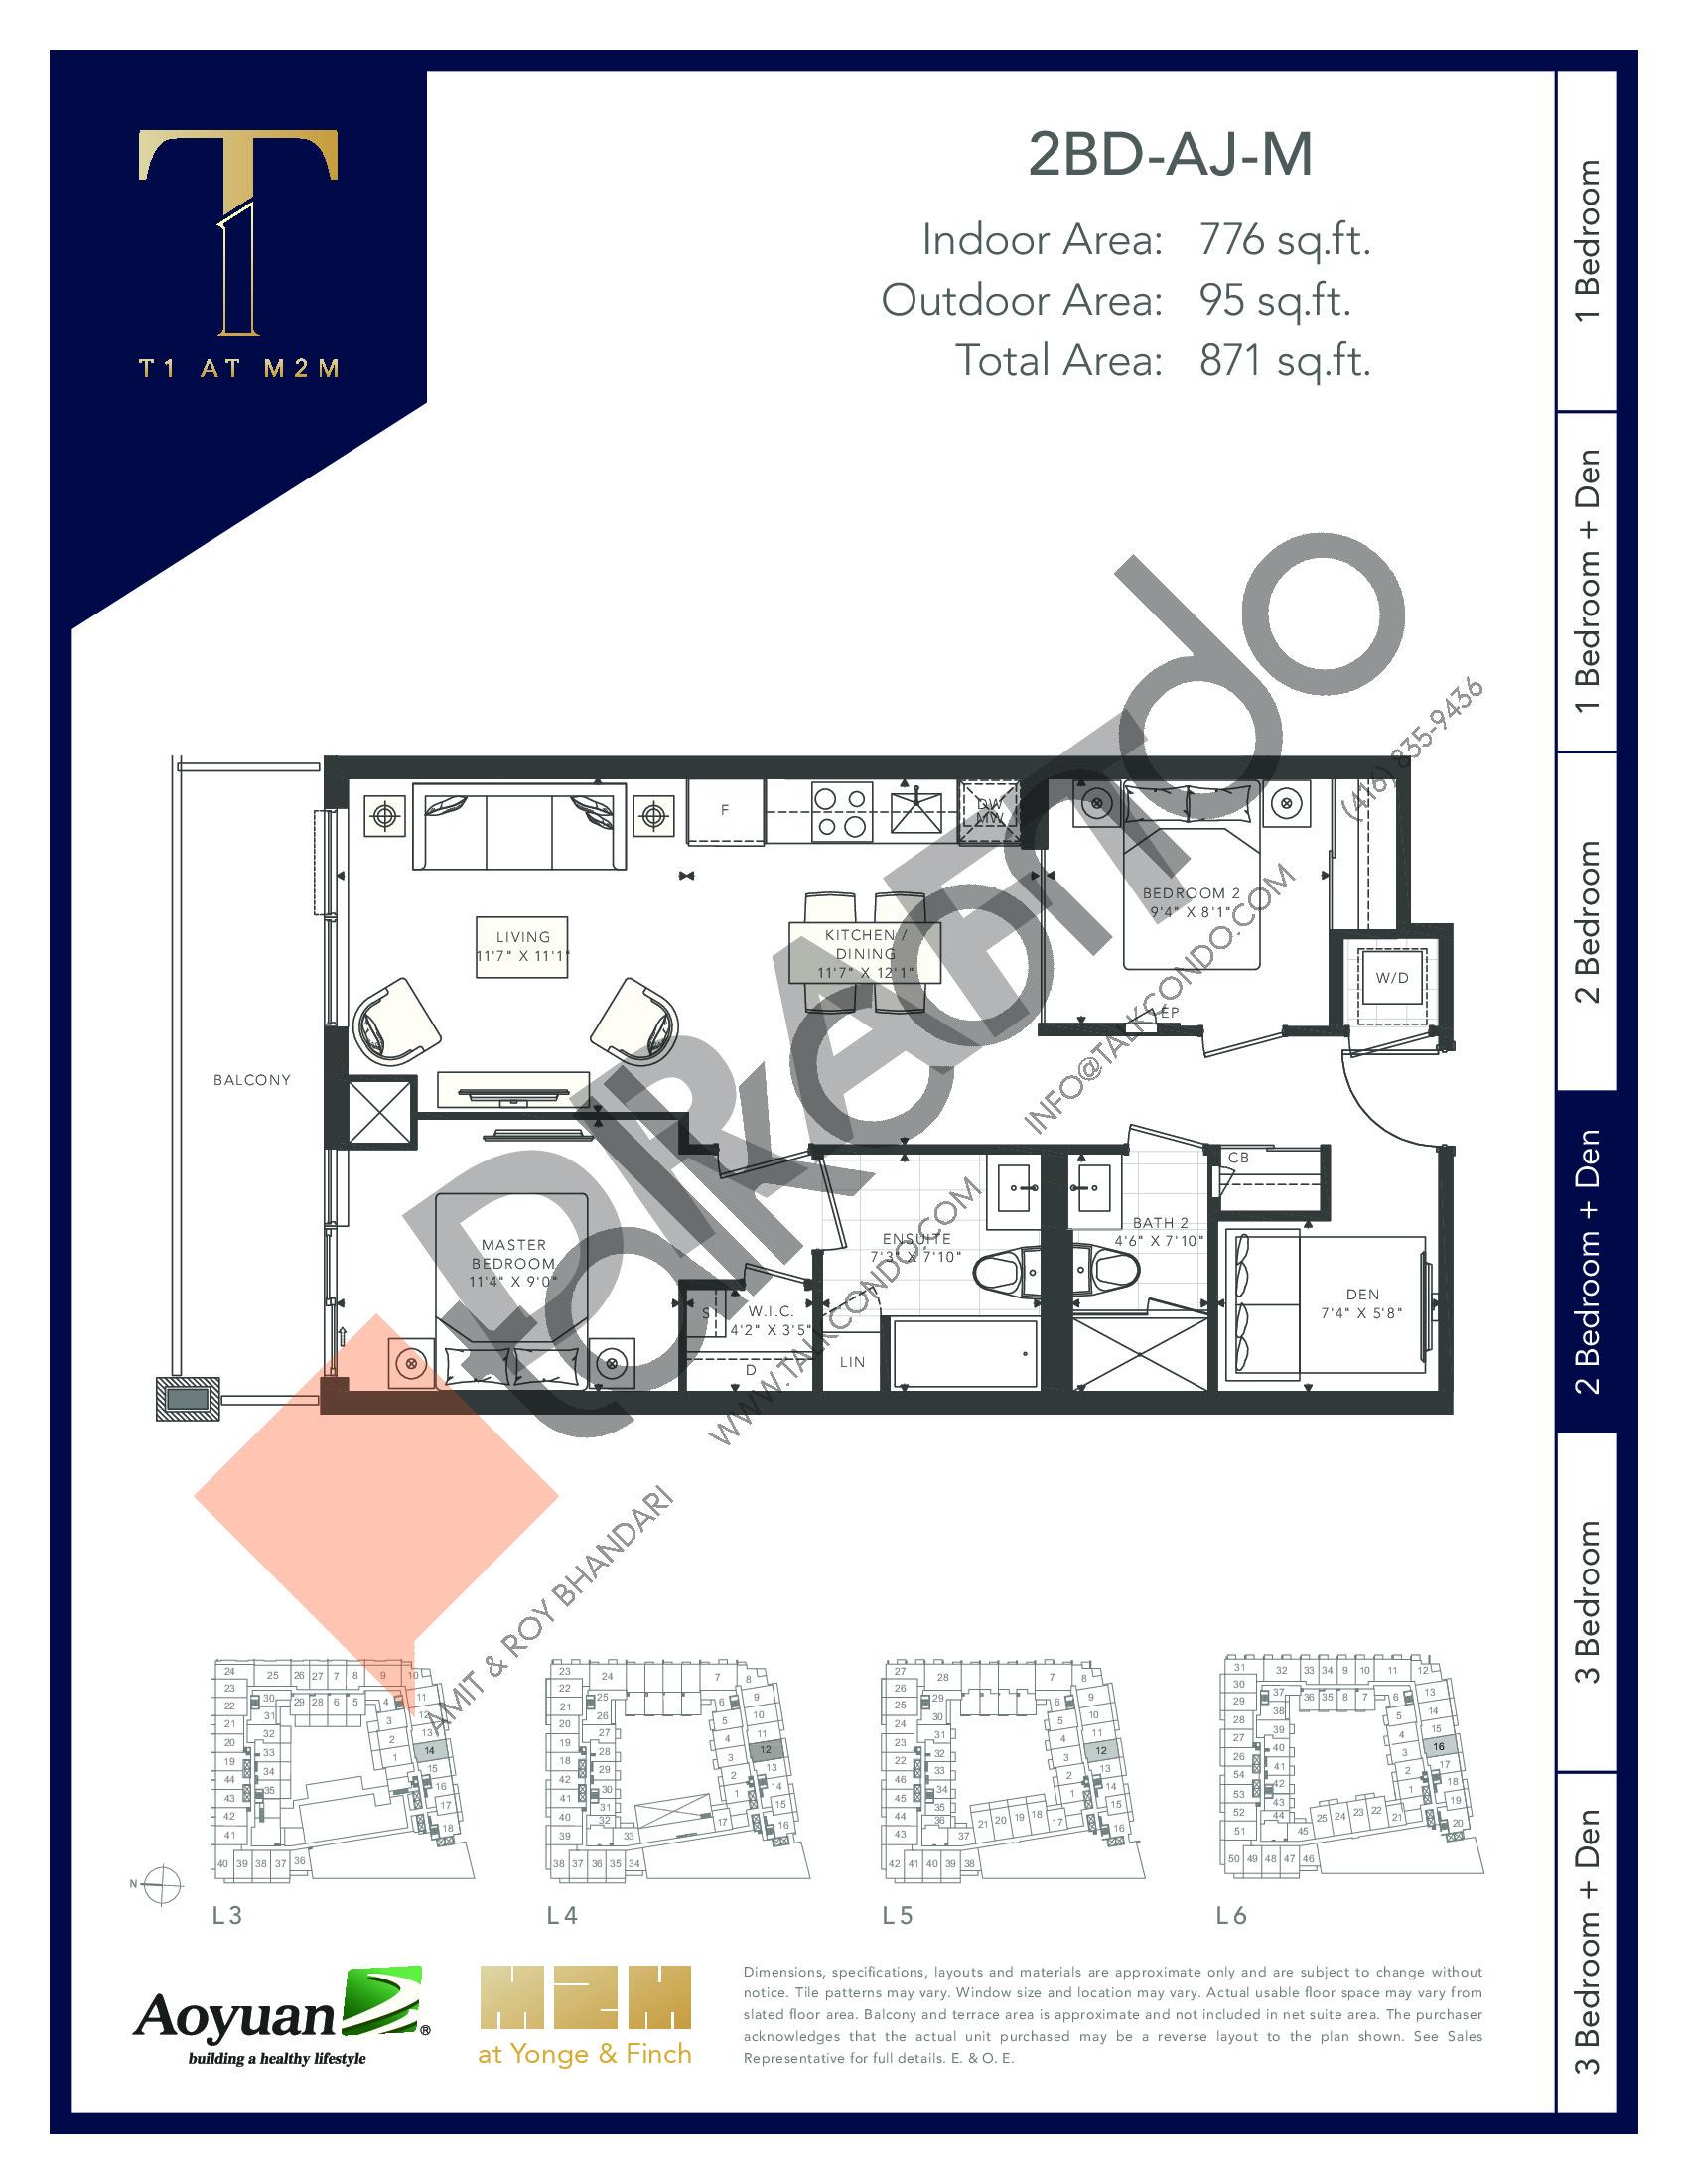 2BD-AJ-M (Podium) Floor Plan at T1 at M2M Condos - 776 sq.ft